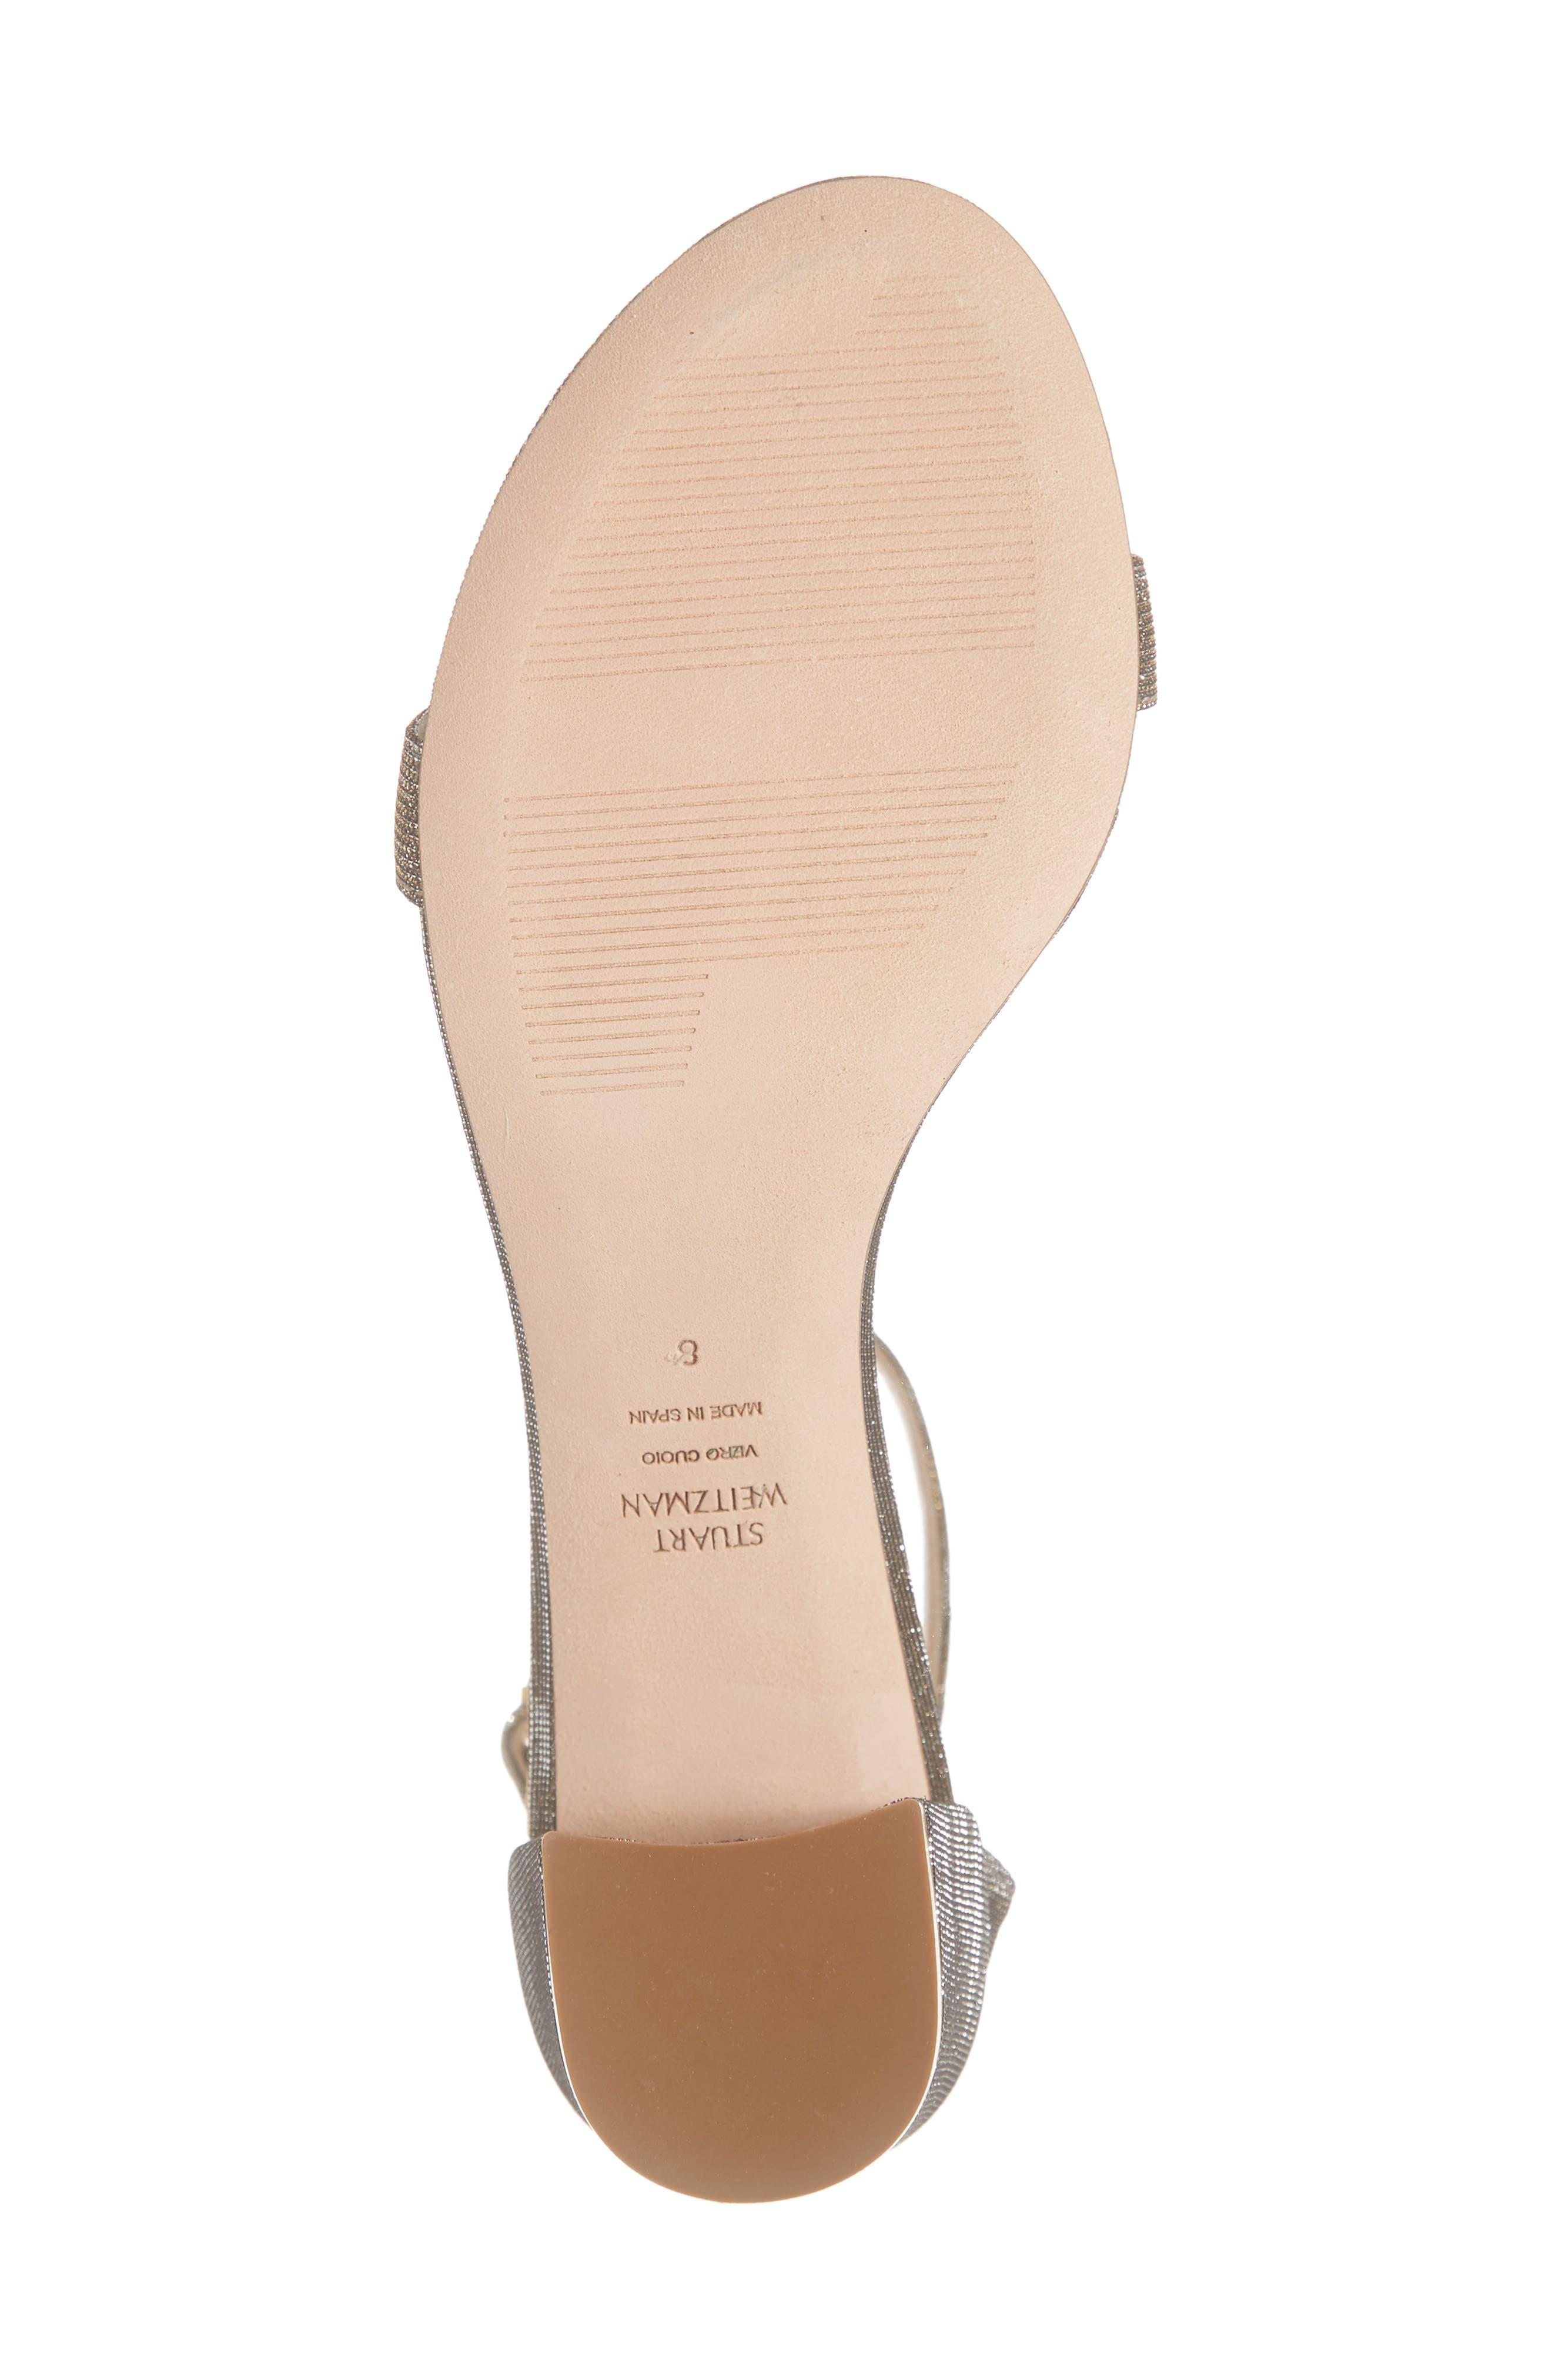 STUART WEITZMAN, Simple Ankle Strap Sandal, Alternate thumbnail 6, color, GOLD NIGHTTIME